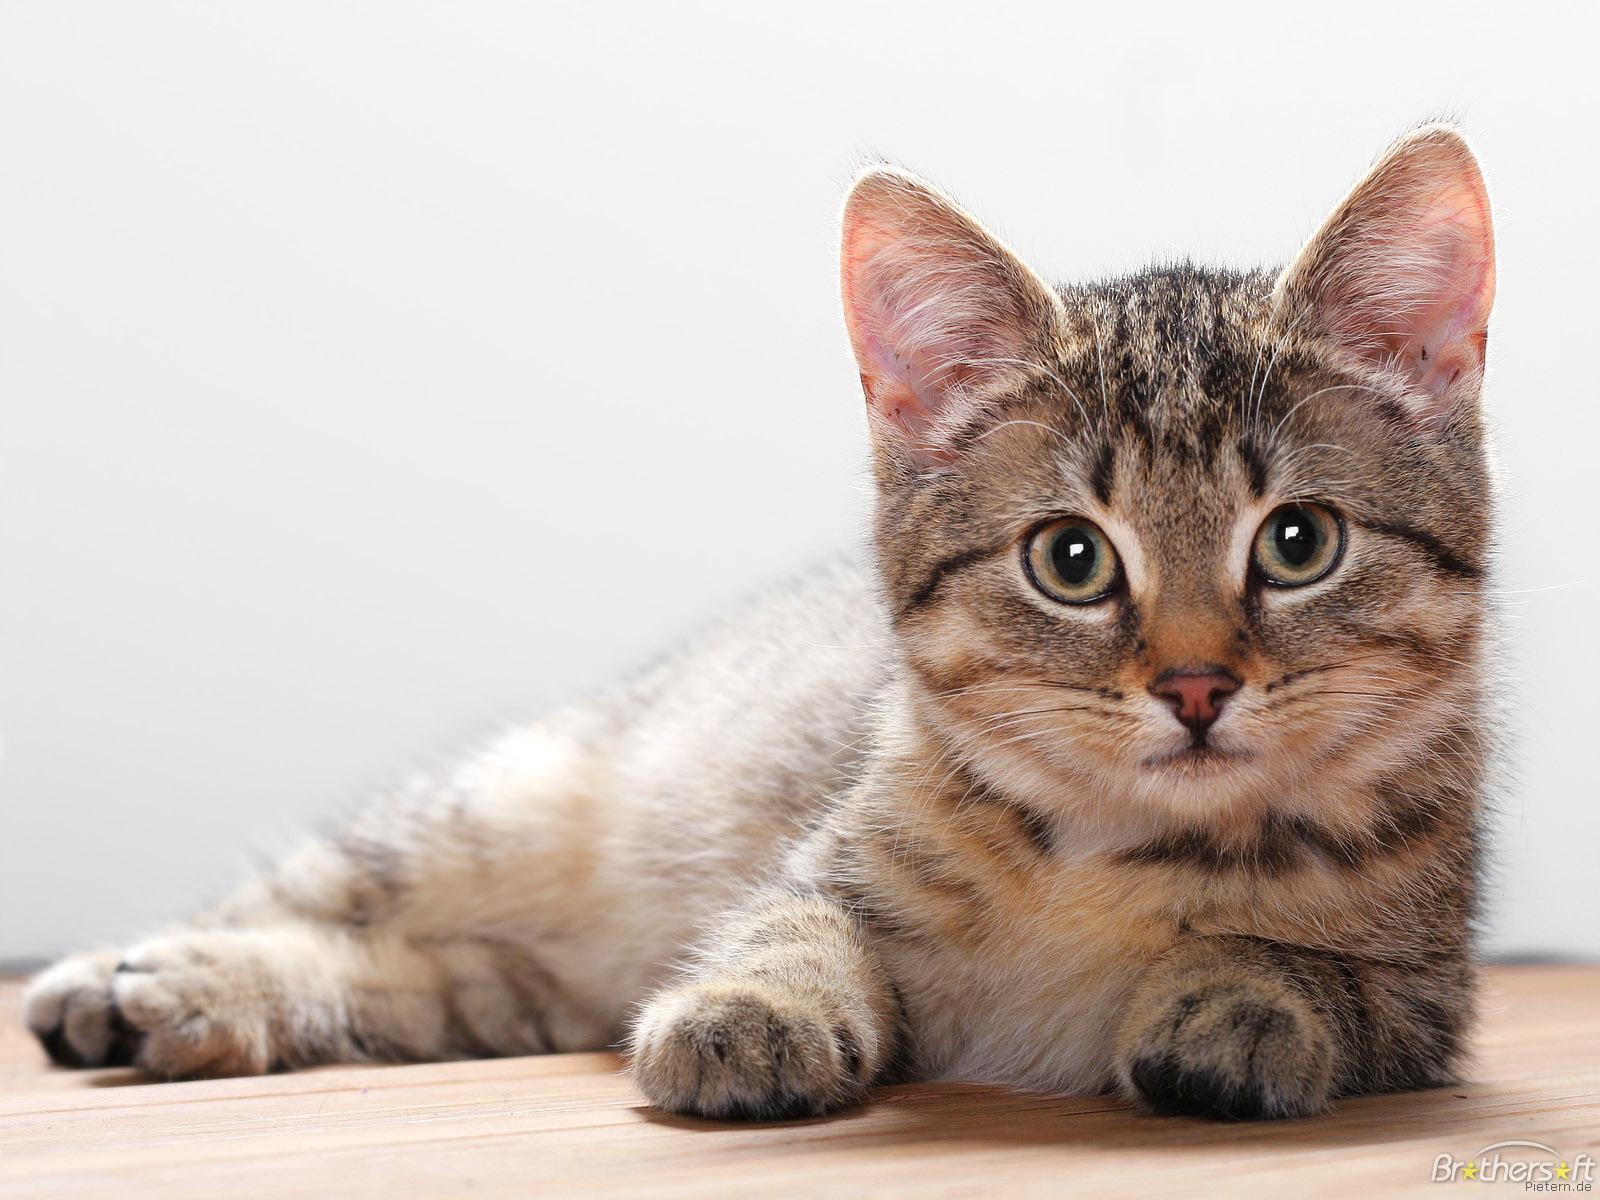 Download Cat Wallpaper Cat Wallpaper Download 1600x1200